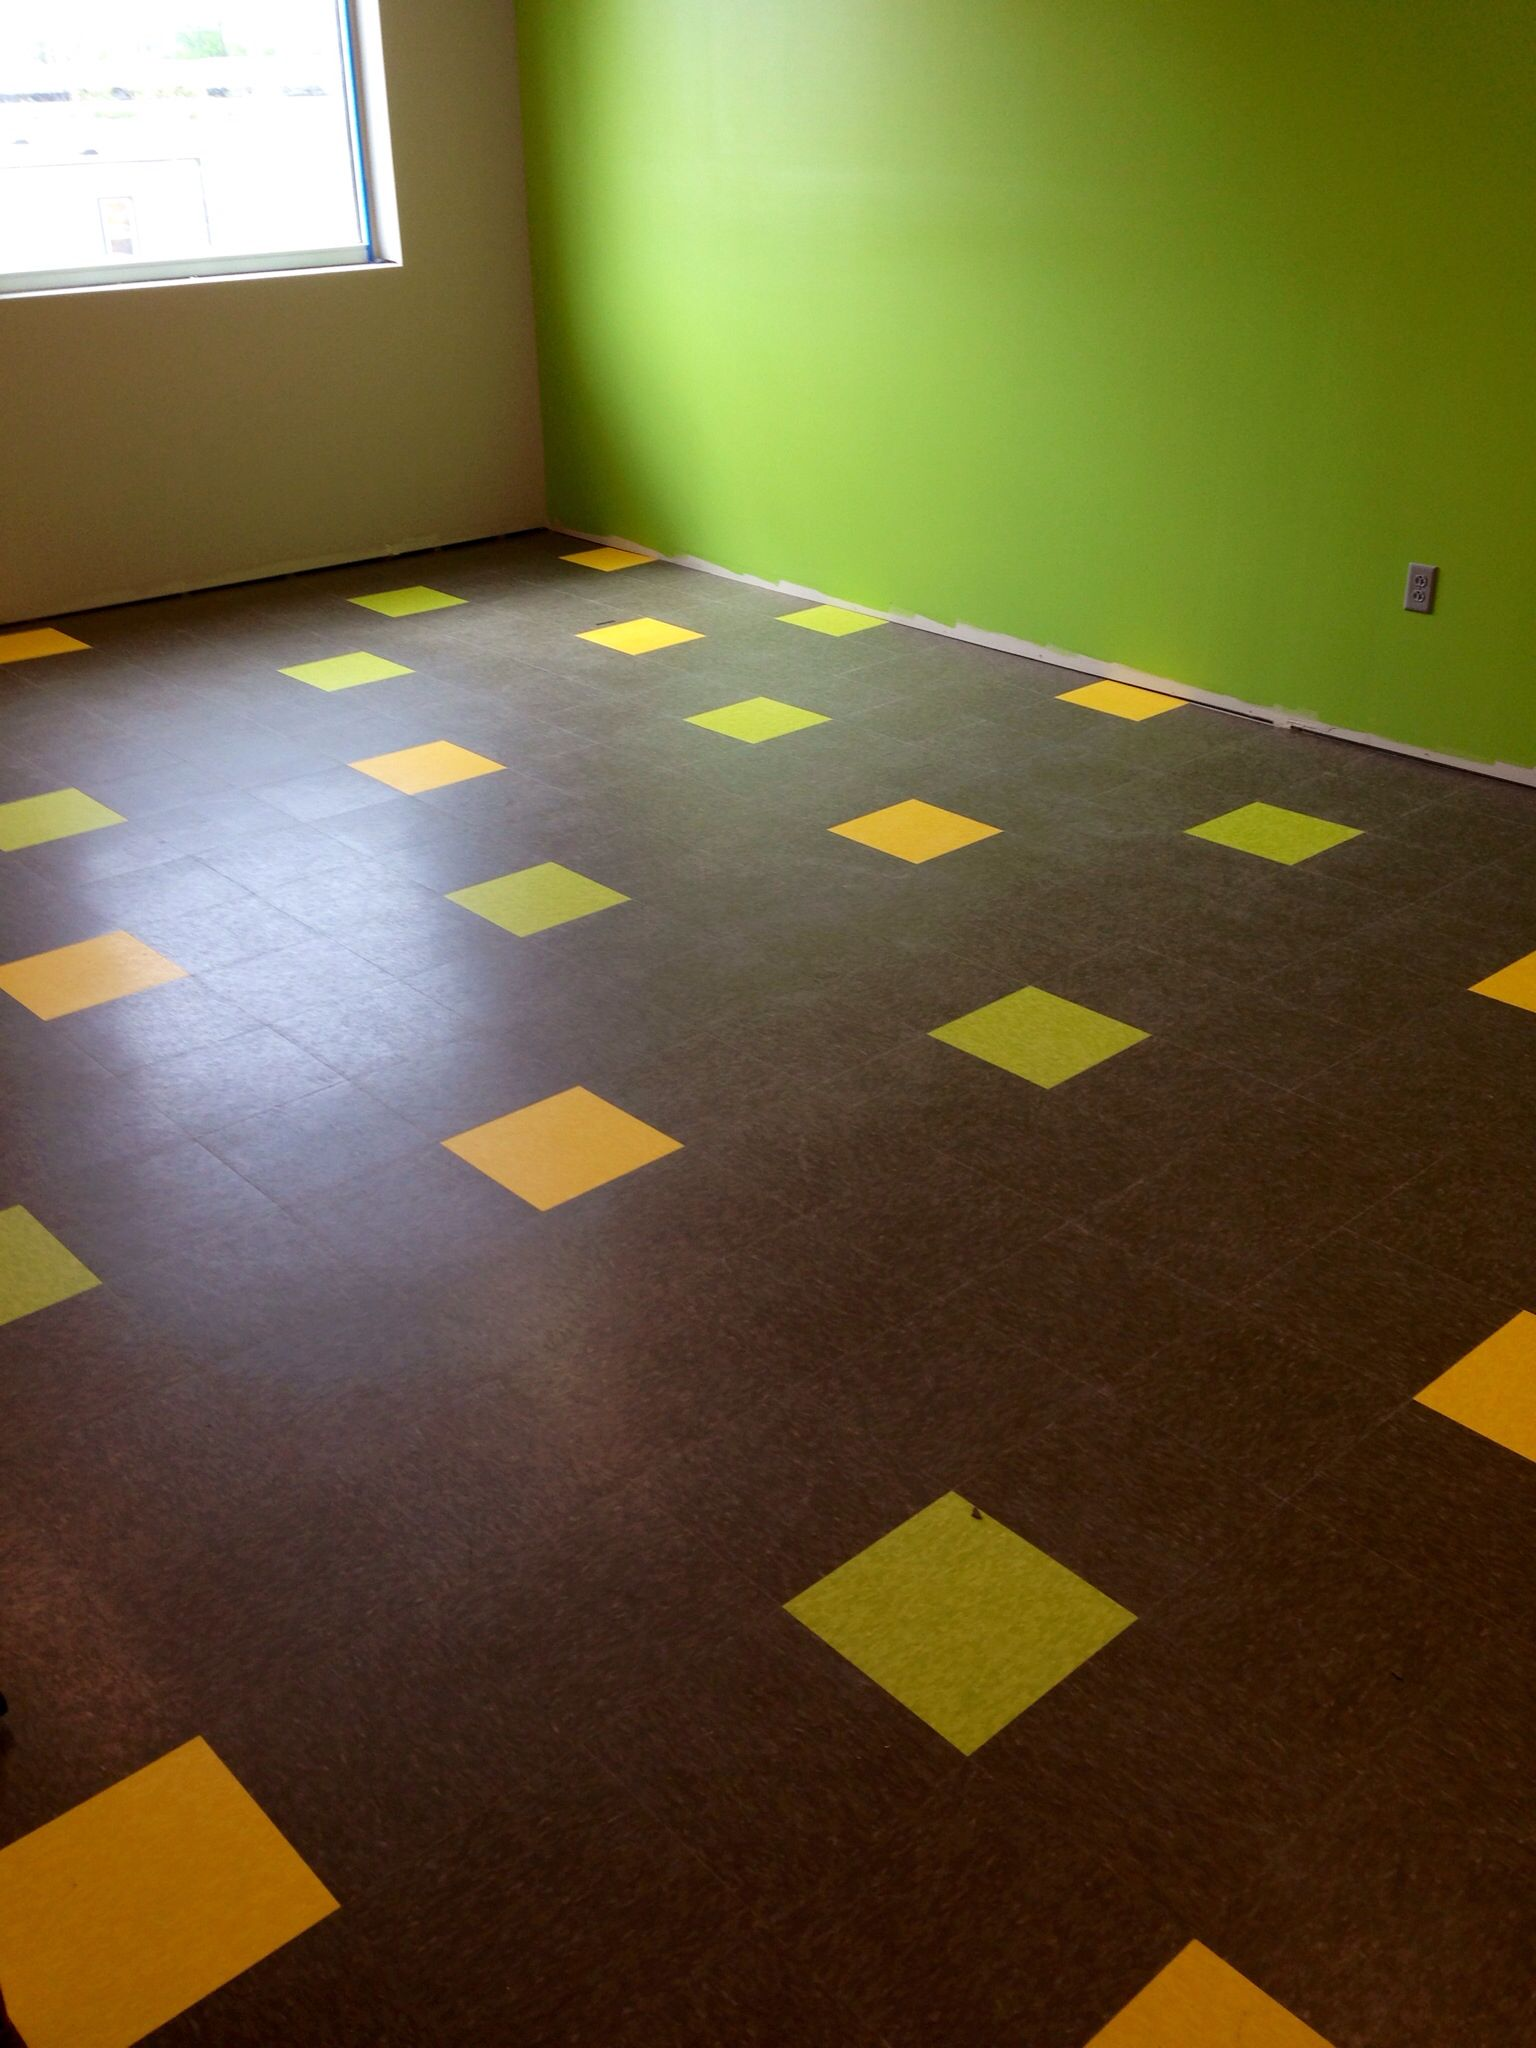 VCT random pattern Tile patterns, Contemporary rug, Flooring